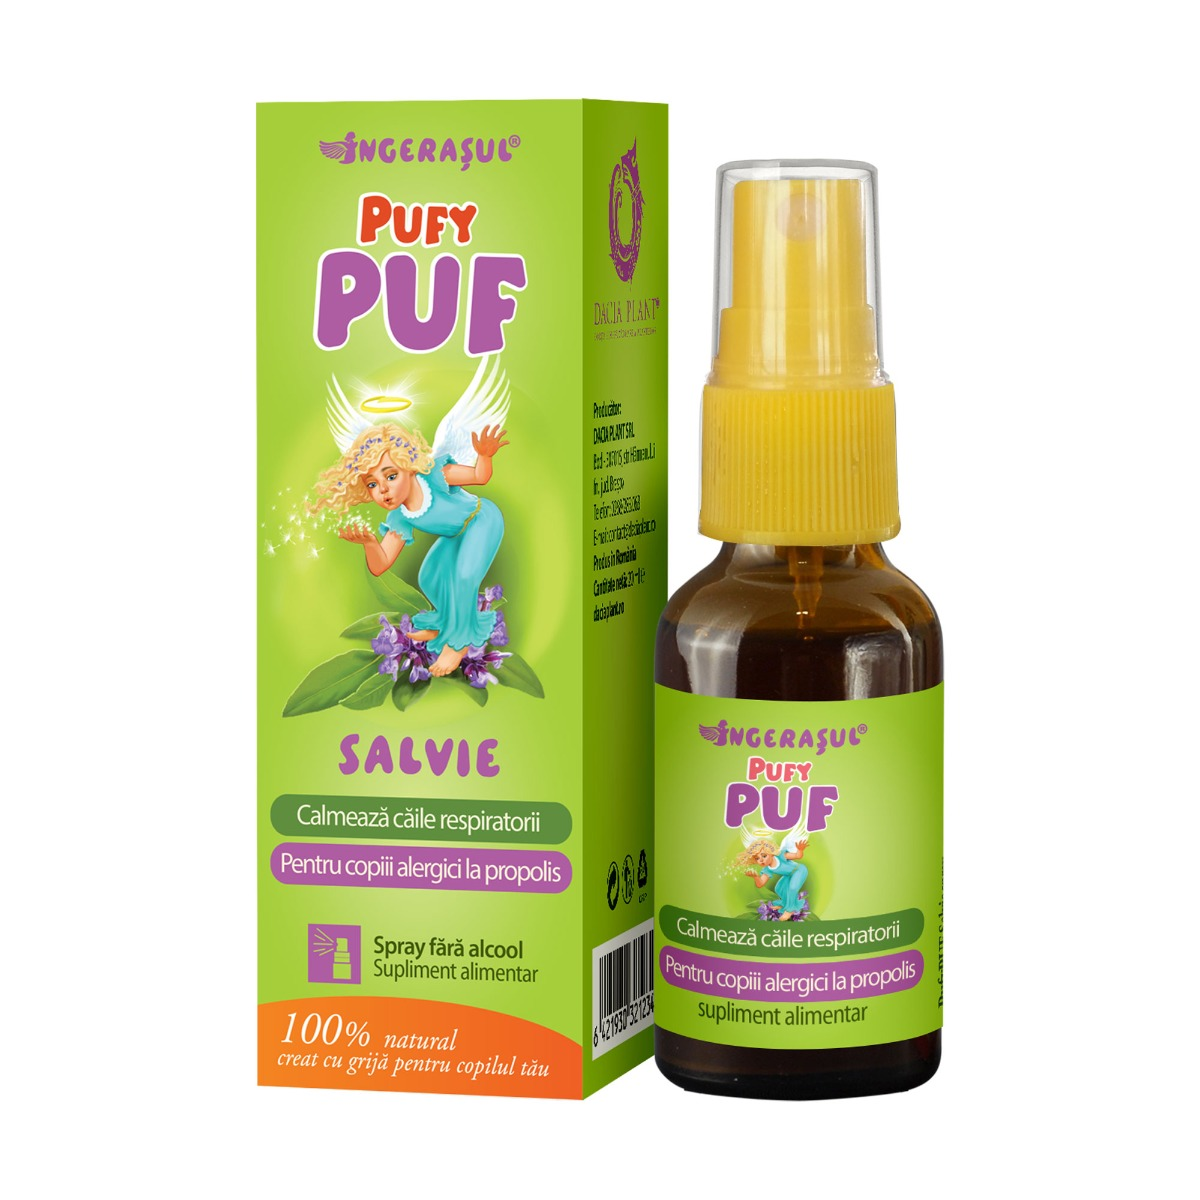 PufyPuf spray salvie, 20 ml, Dacia Plant drmax.ro